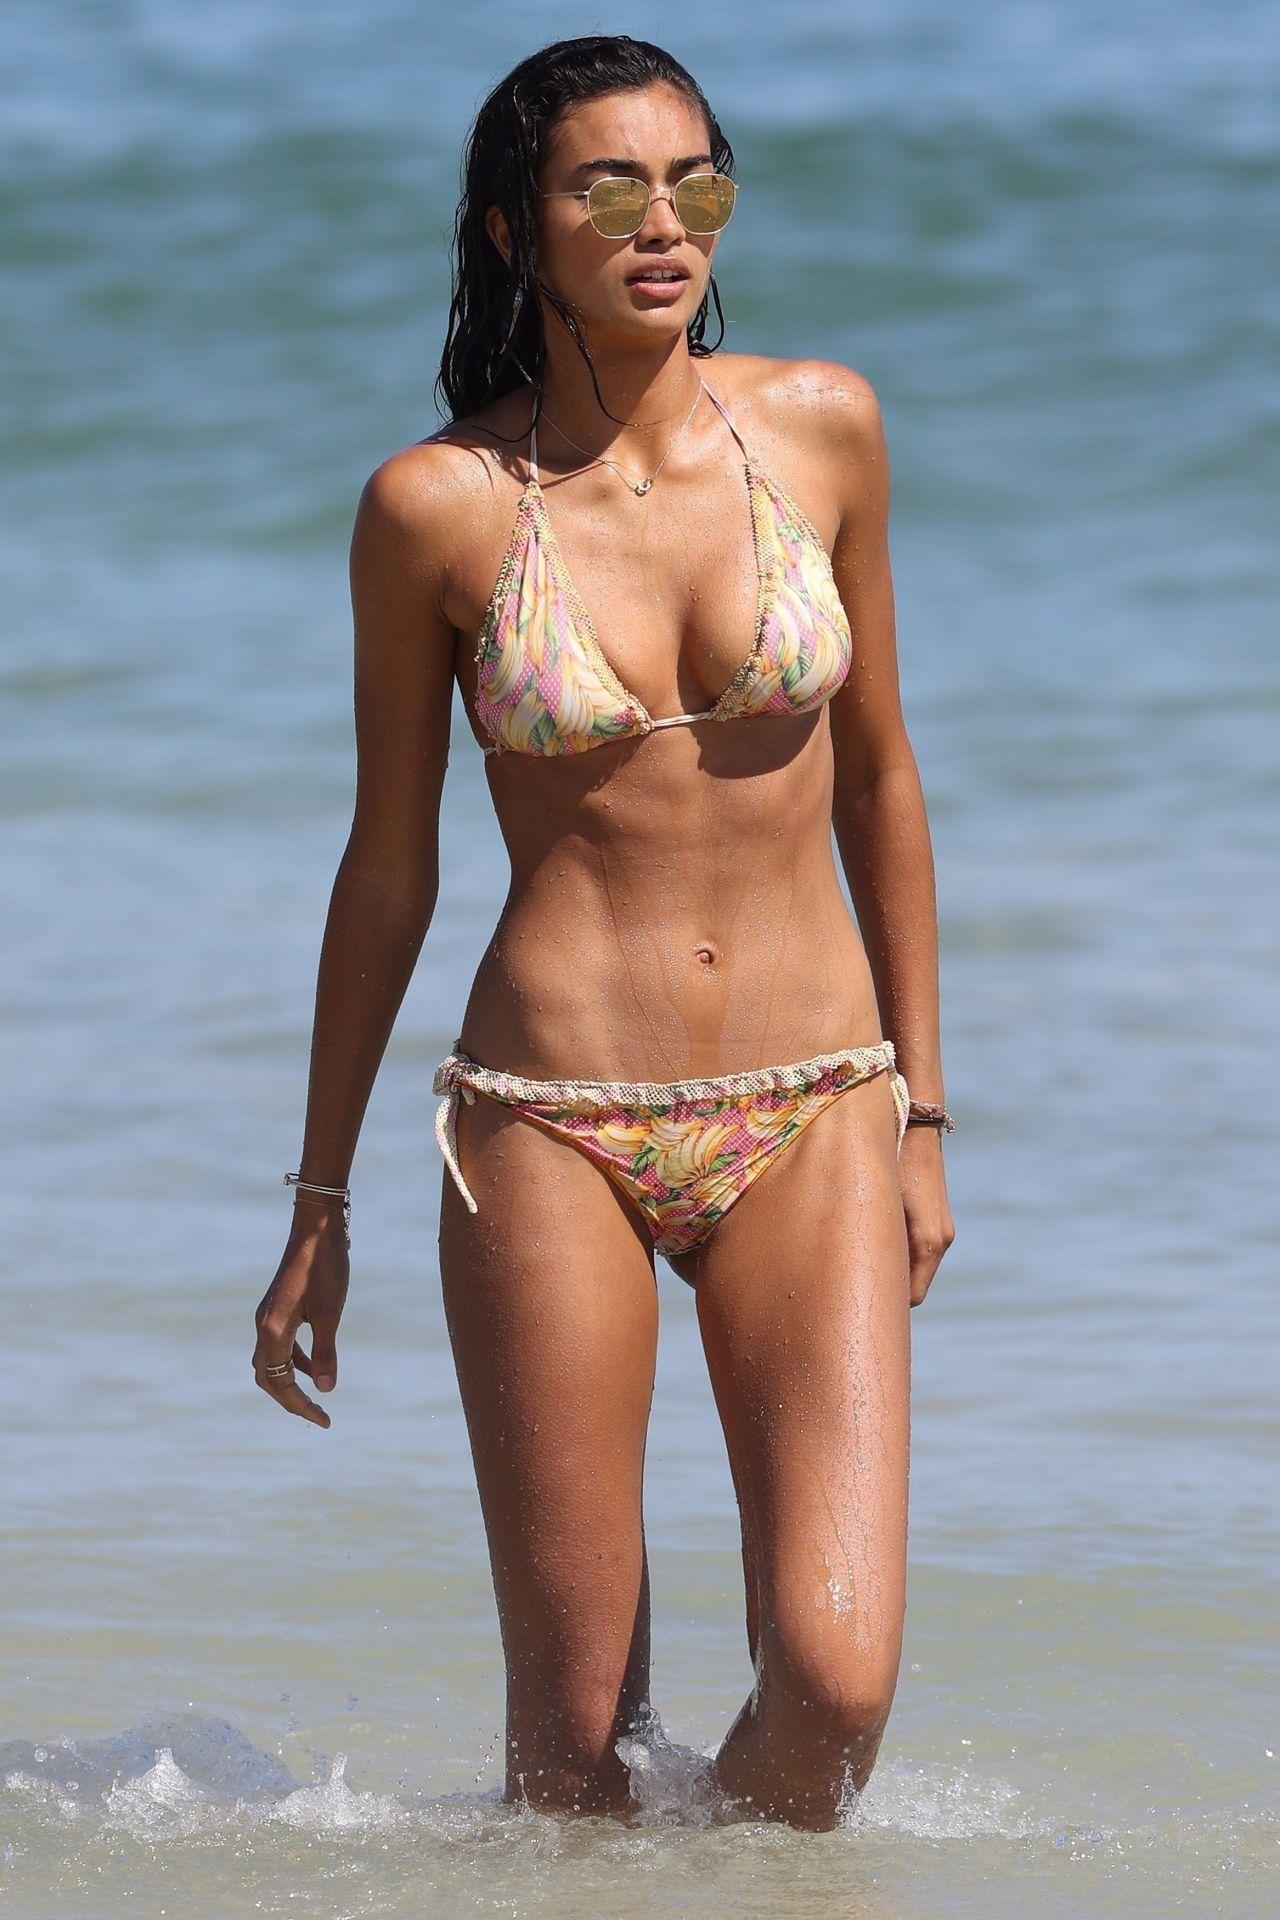 Kelly Gale in Bikini on Bondi Beach in Sydney Pic 10 of 35